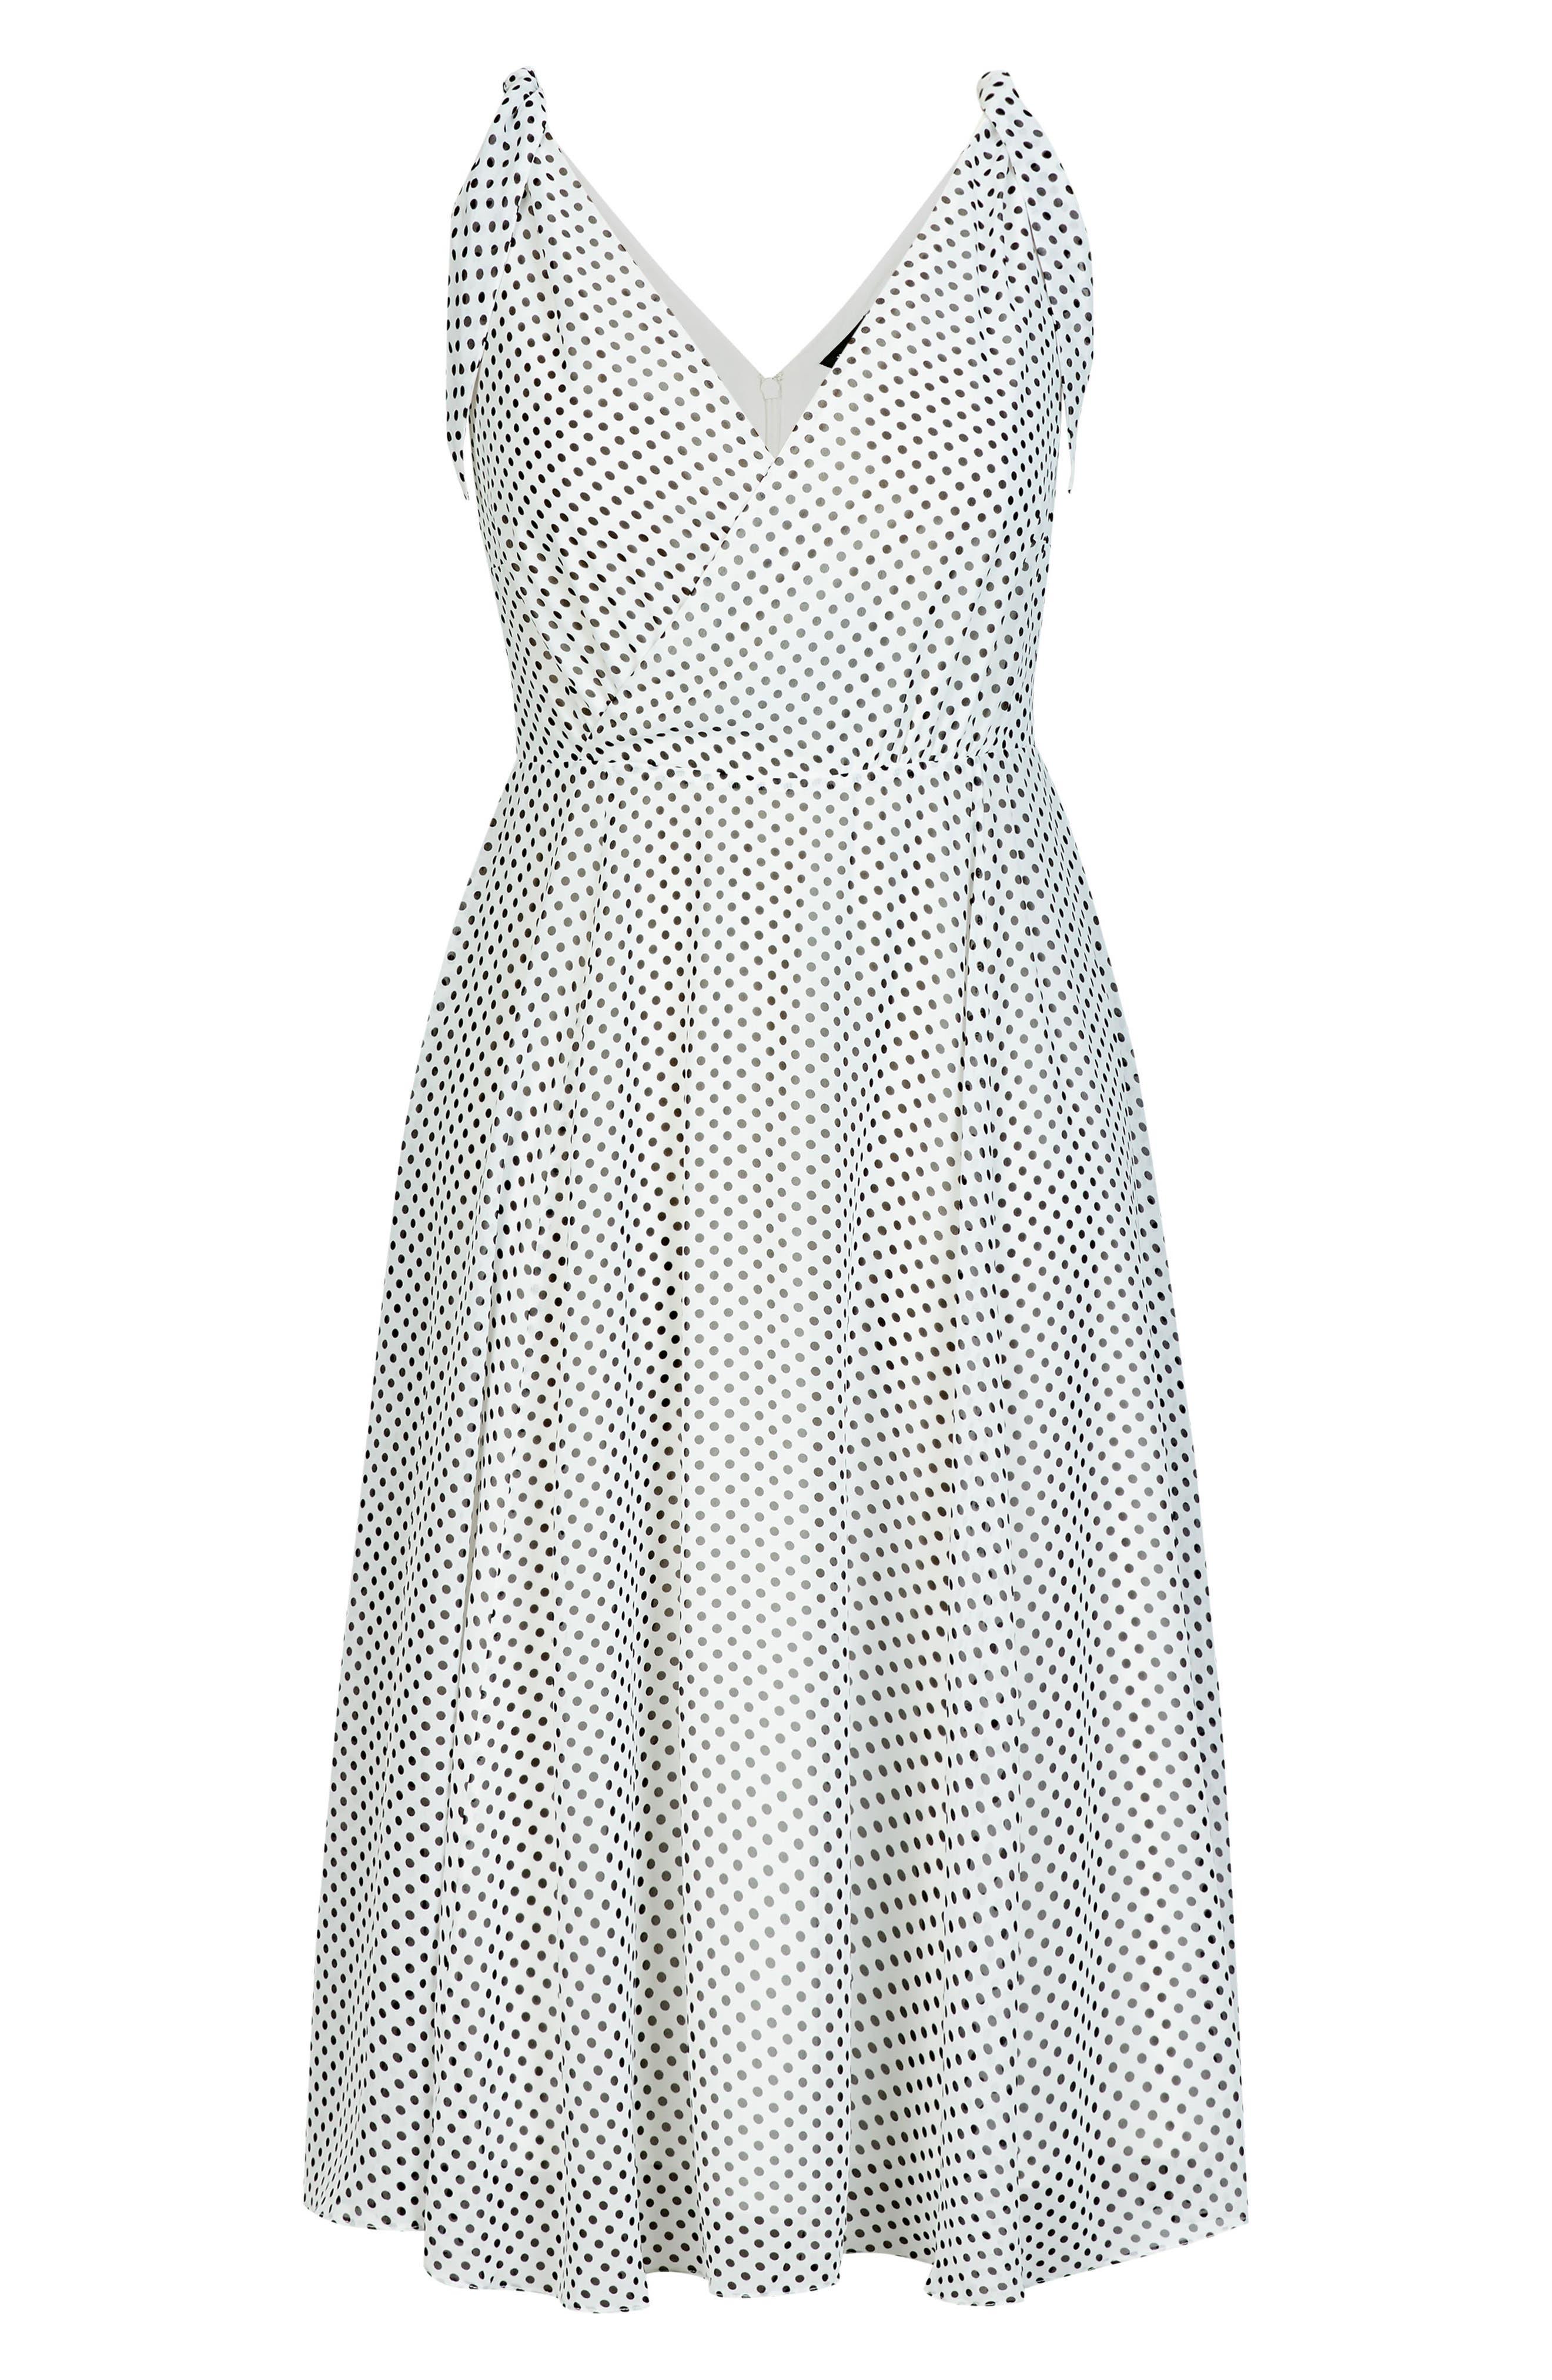 CITY CHIC, Alika Dot Fit & Flare Dress, Alternate thumbnail 8, color, IVORY